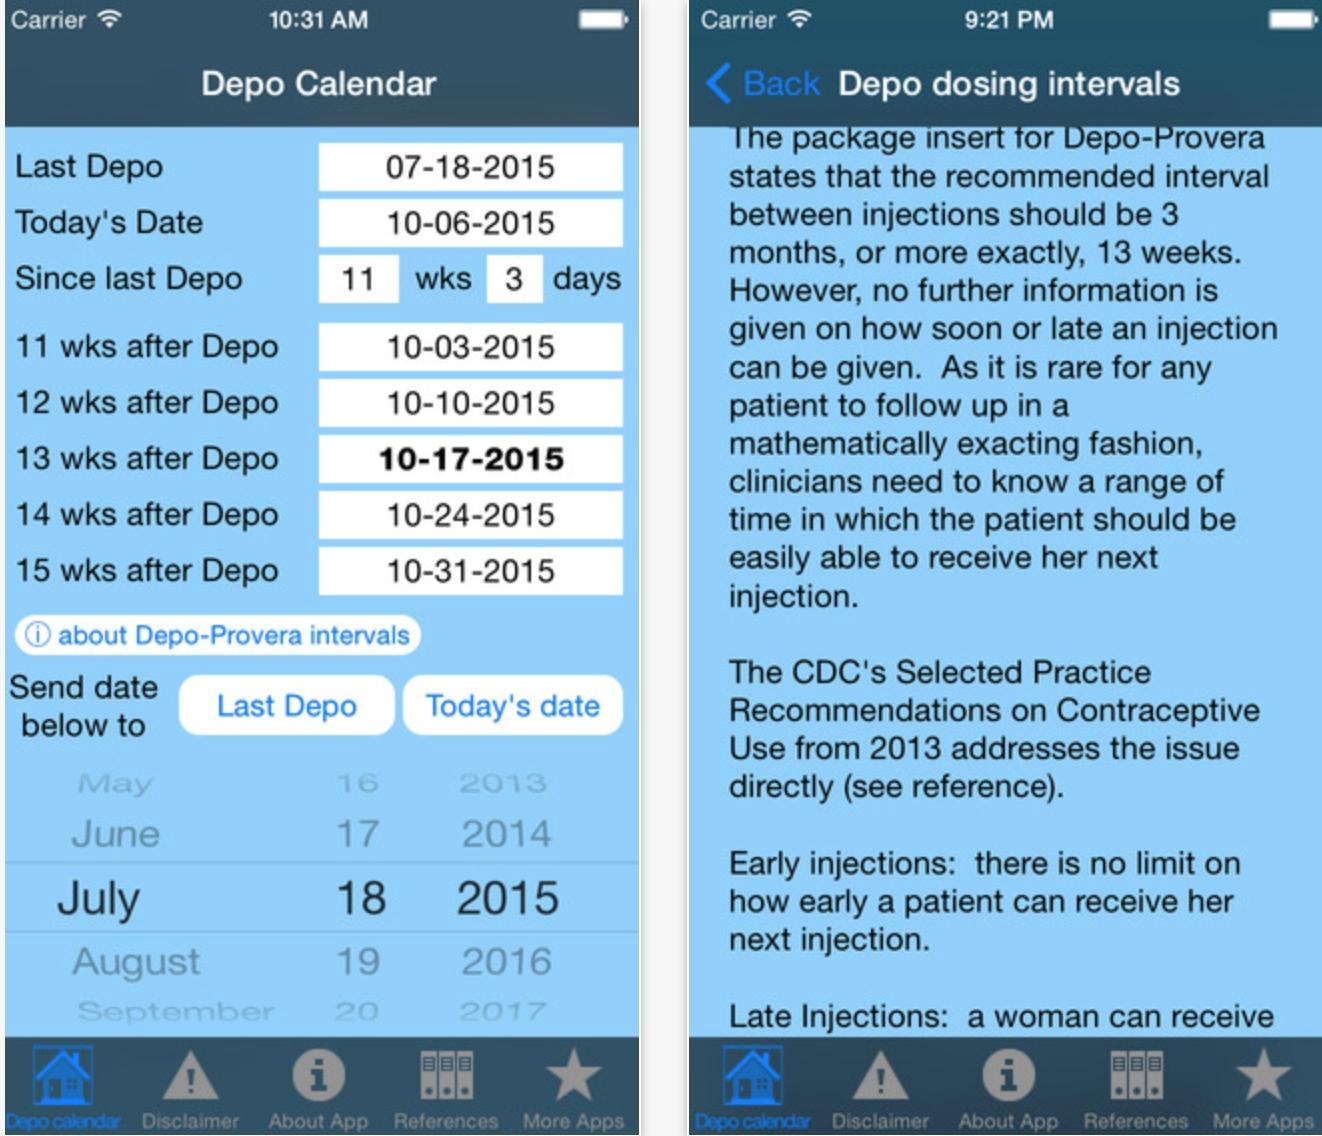 Depo Calendar App Could Significantly Improve Contraception  Calcultarot Depo Injesction